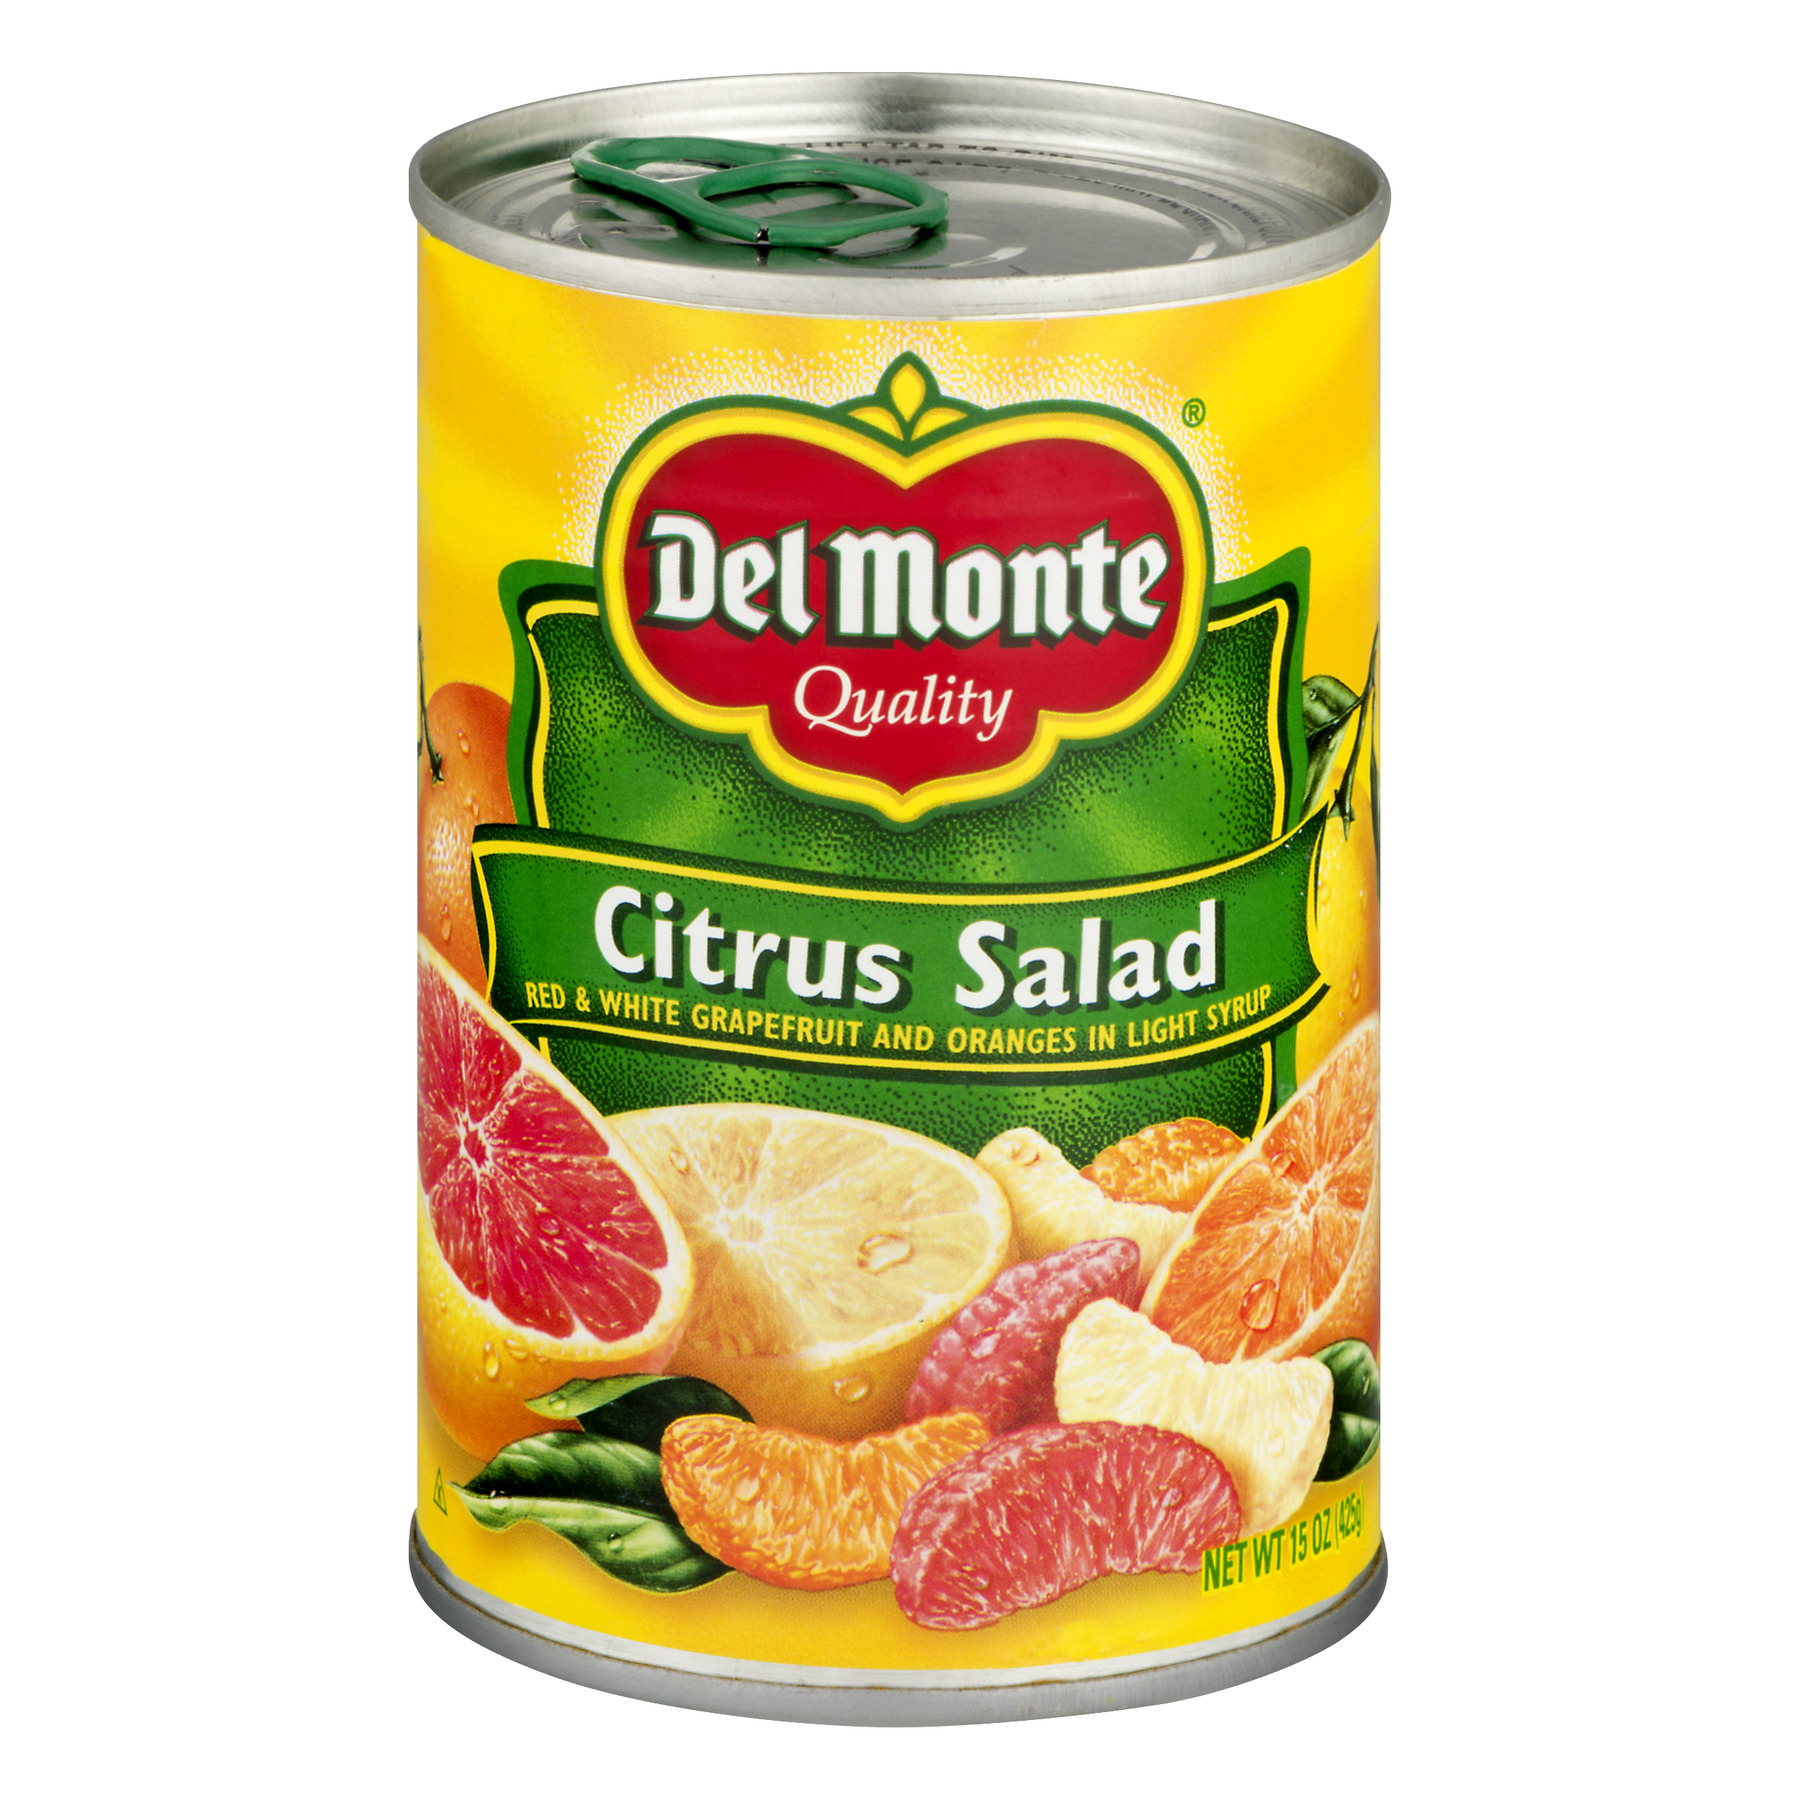 Del Monte Orange Se ctions & Red White Grapefruit In Light Citrus Salad, 15 oz by Citrus